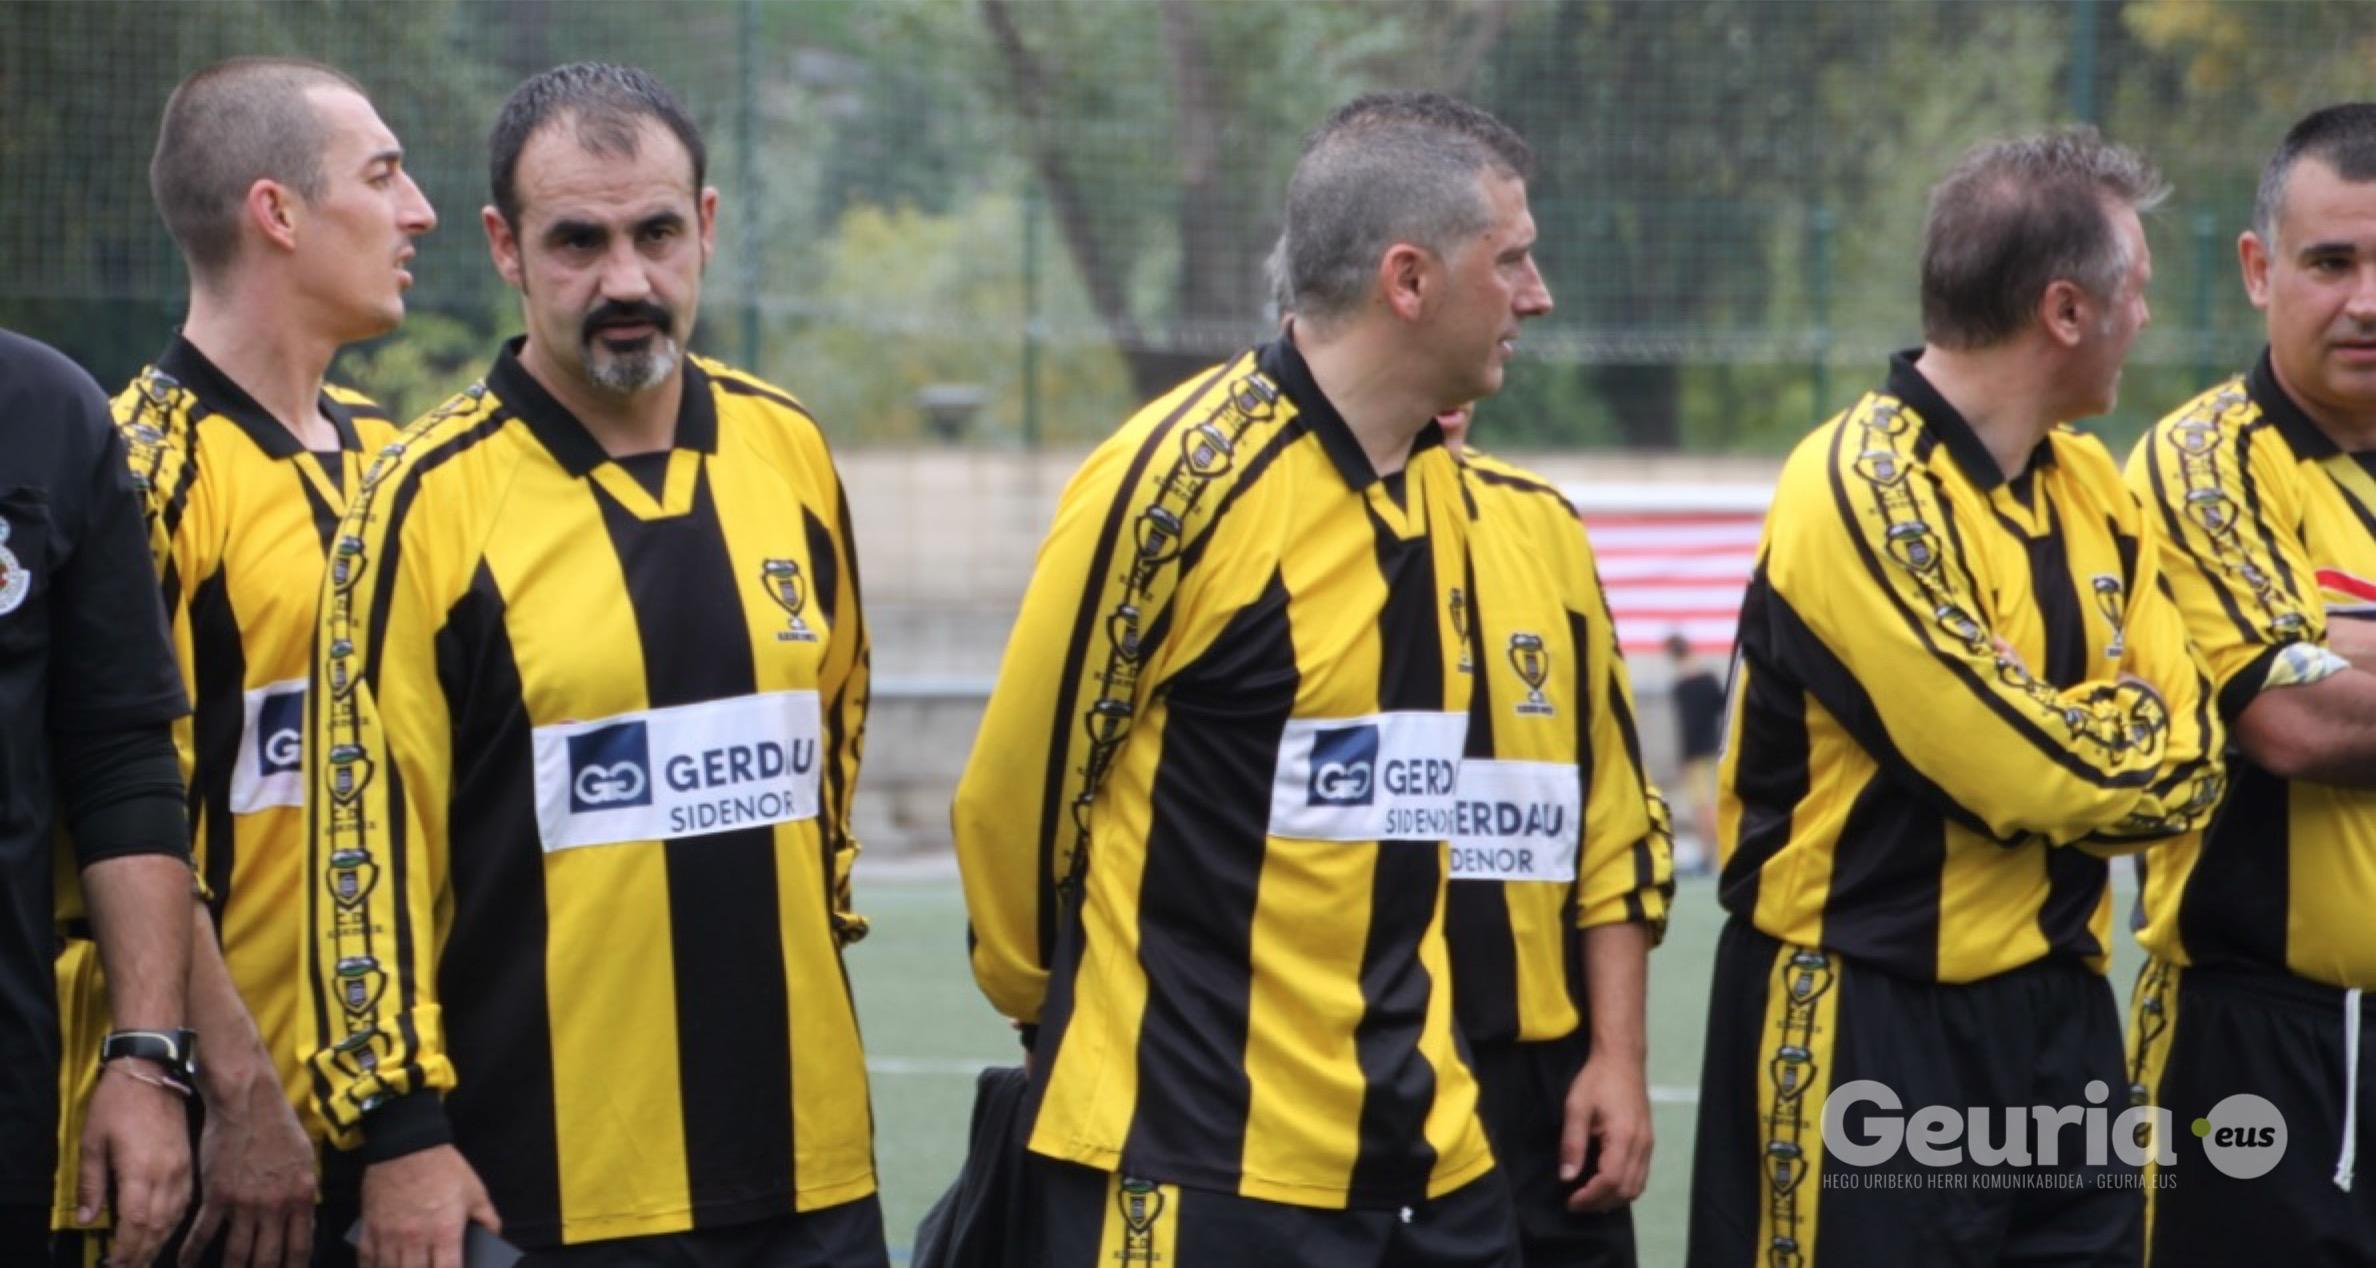 basauri_san_fausto_2015_futbol_basconia_beteranoak_23